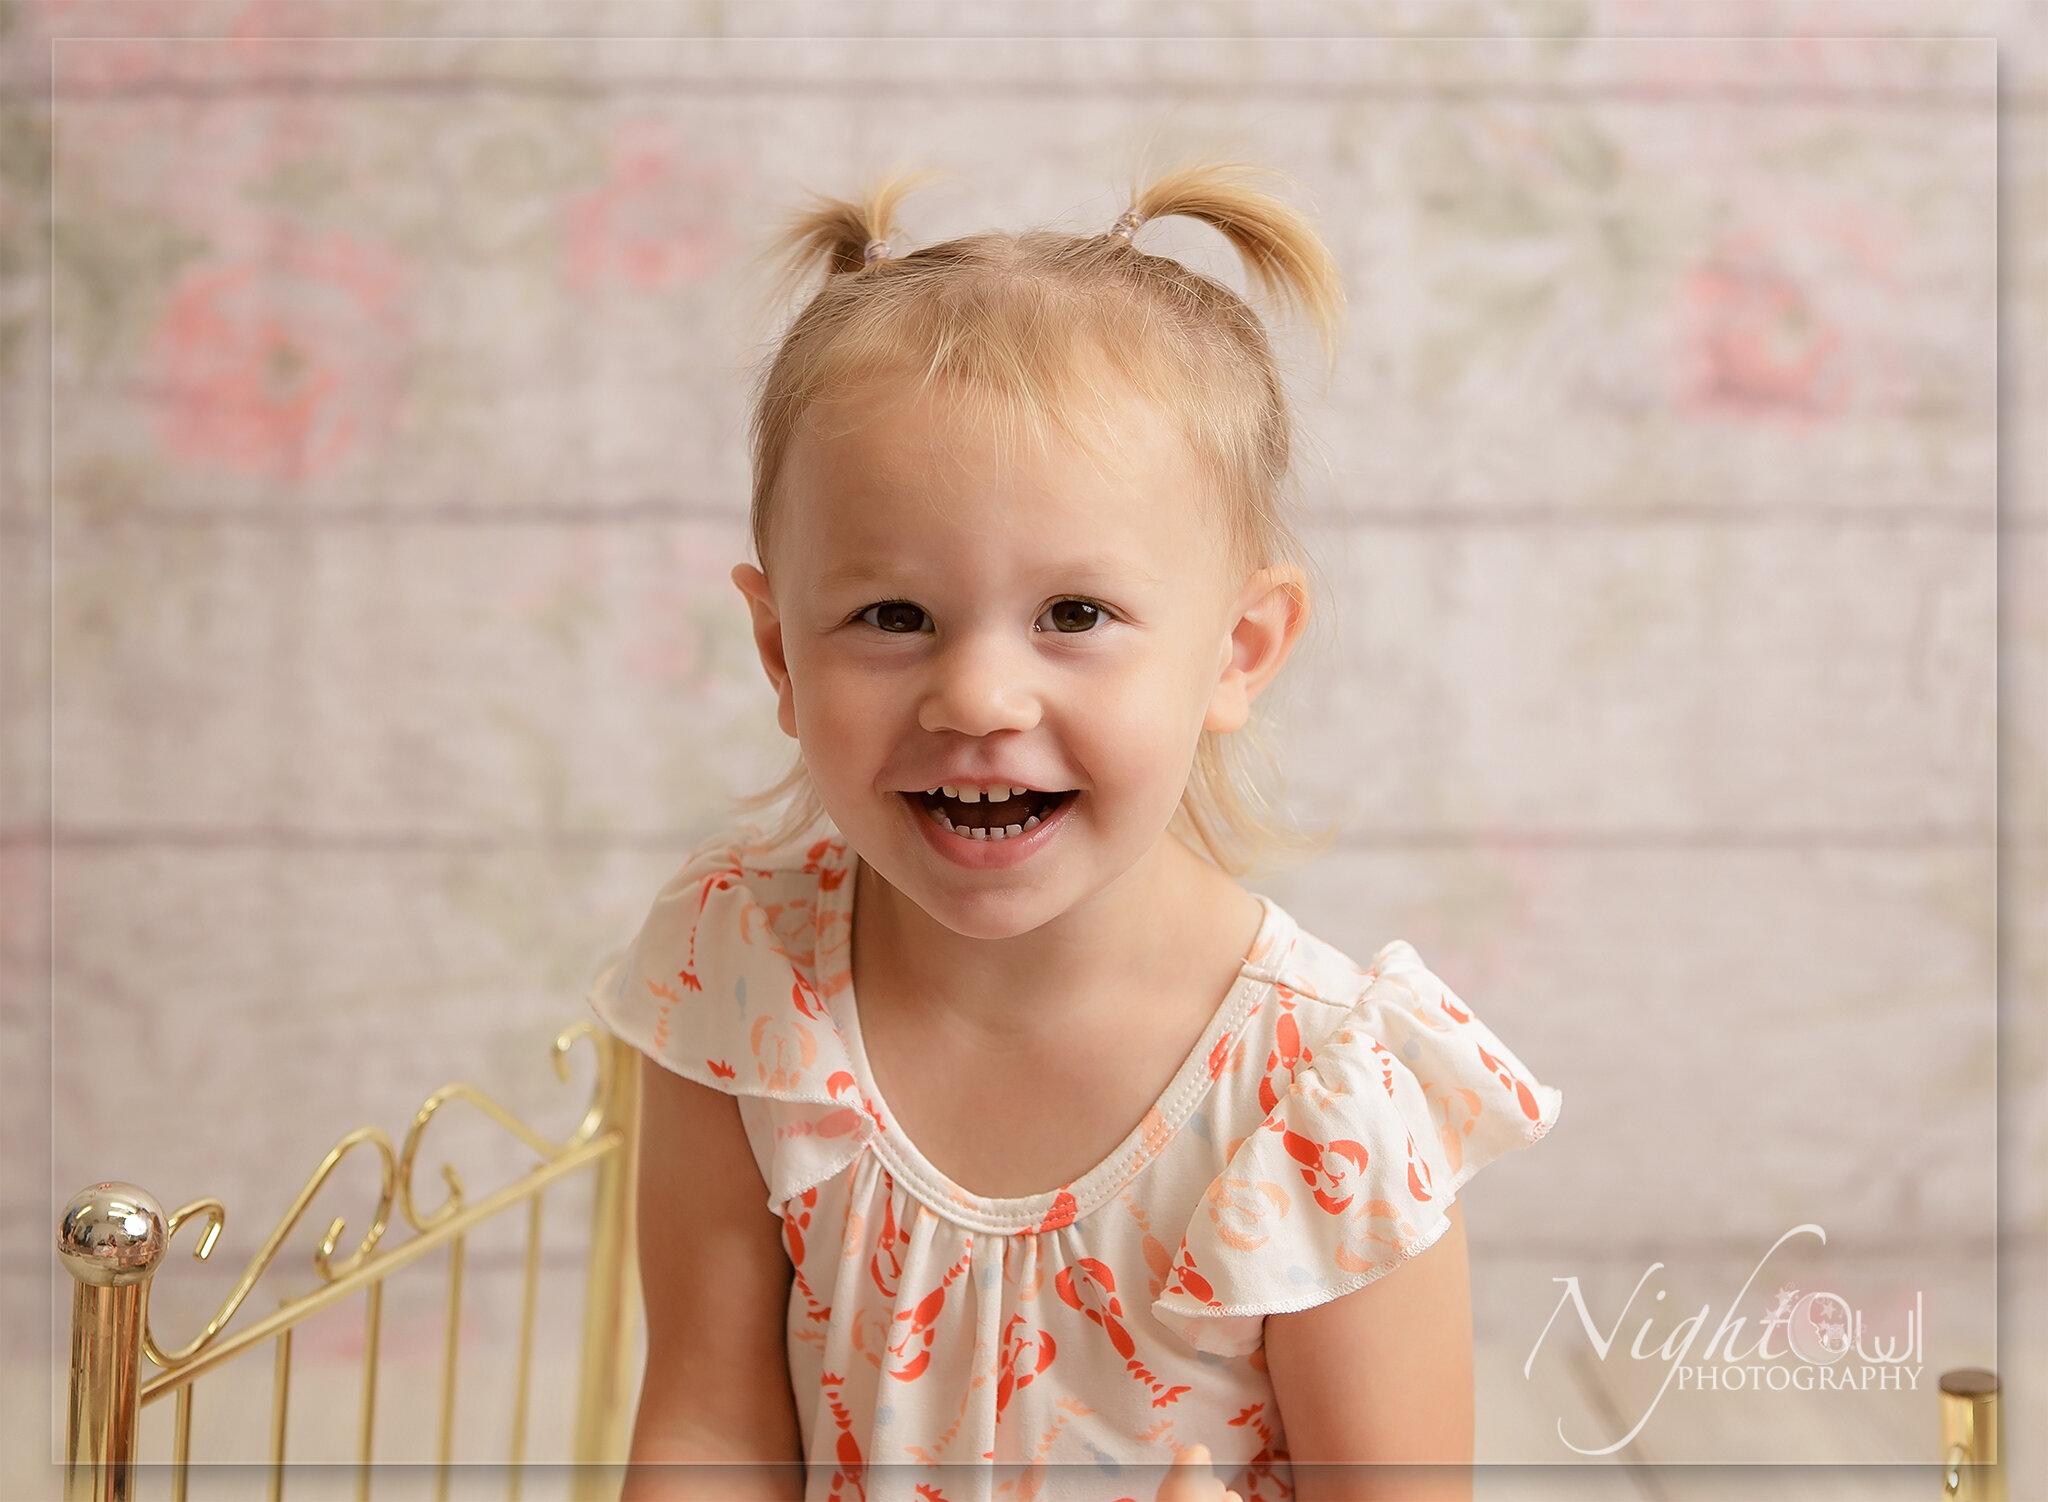 St. joseph Michigan Child photography studio